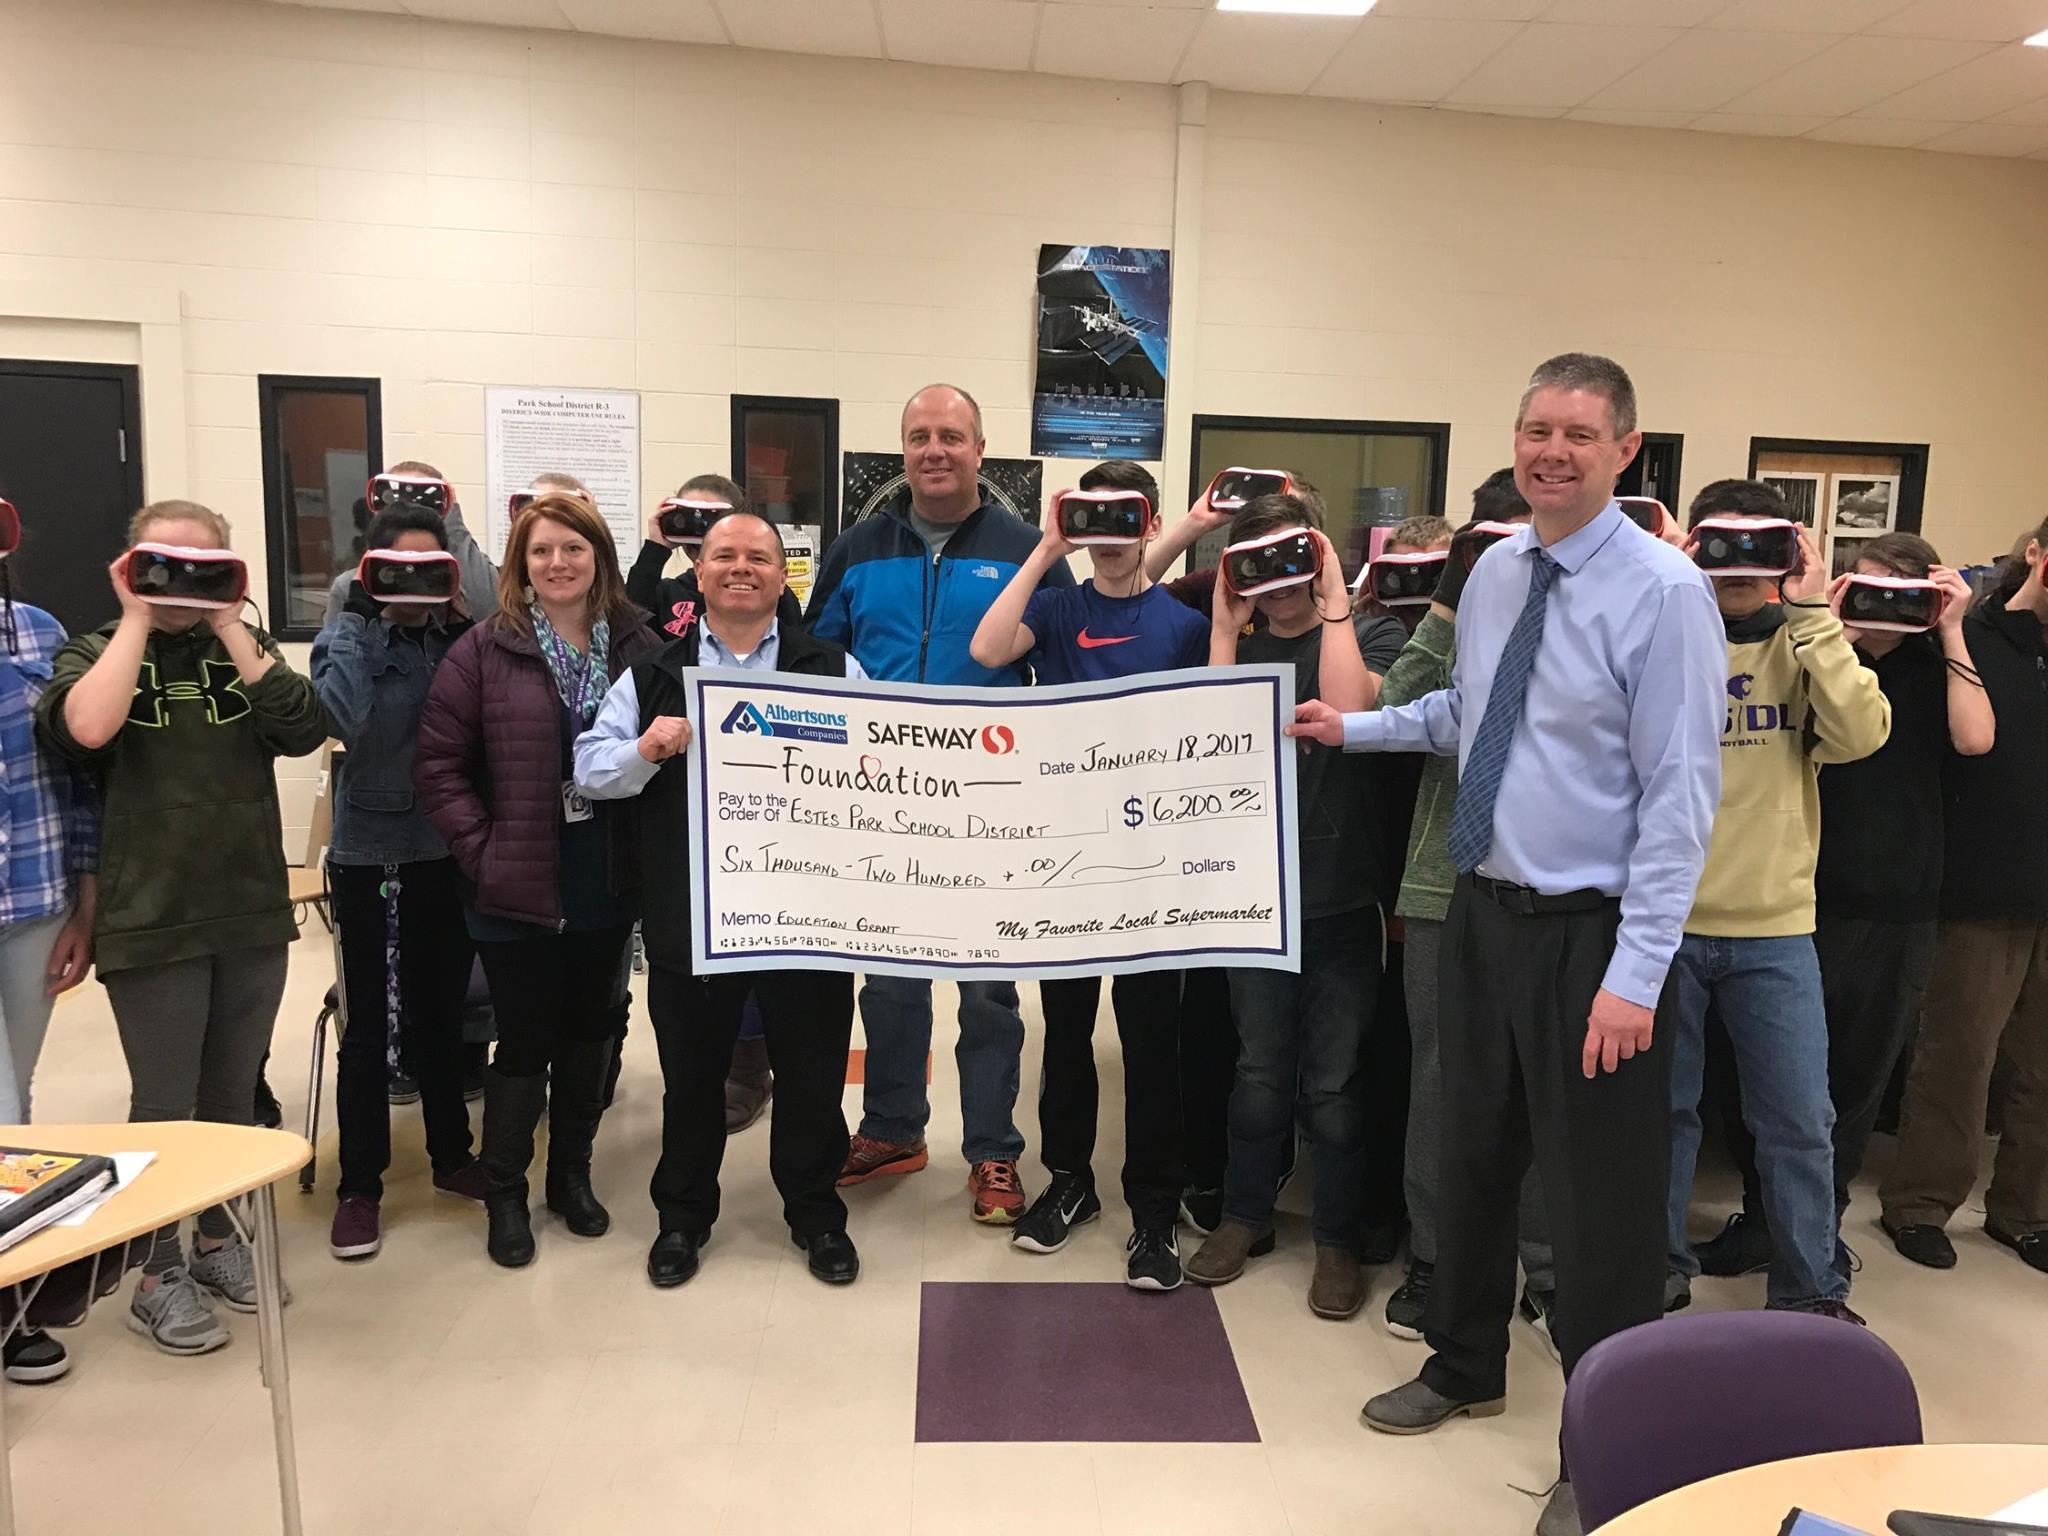 Here, Estes Park Safeway Manager, Eddie Martinez, presents the Estes Park Middle School with a check for $6,200.00.